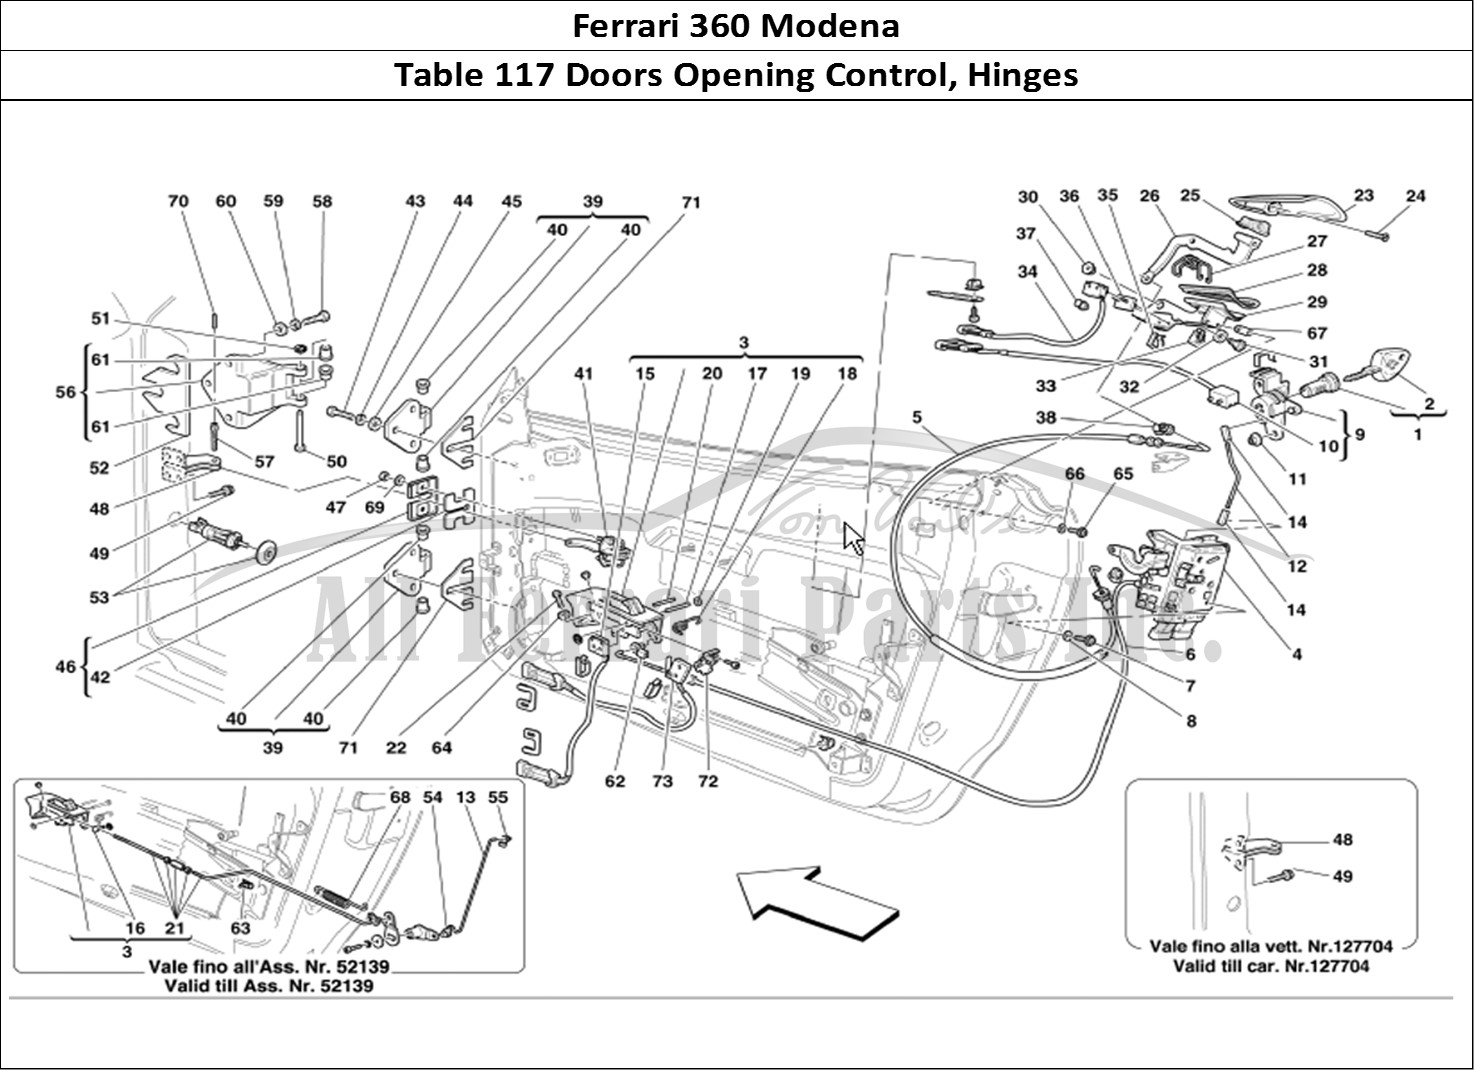 ferrari idb40 wiring diagram